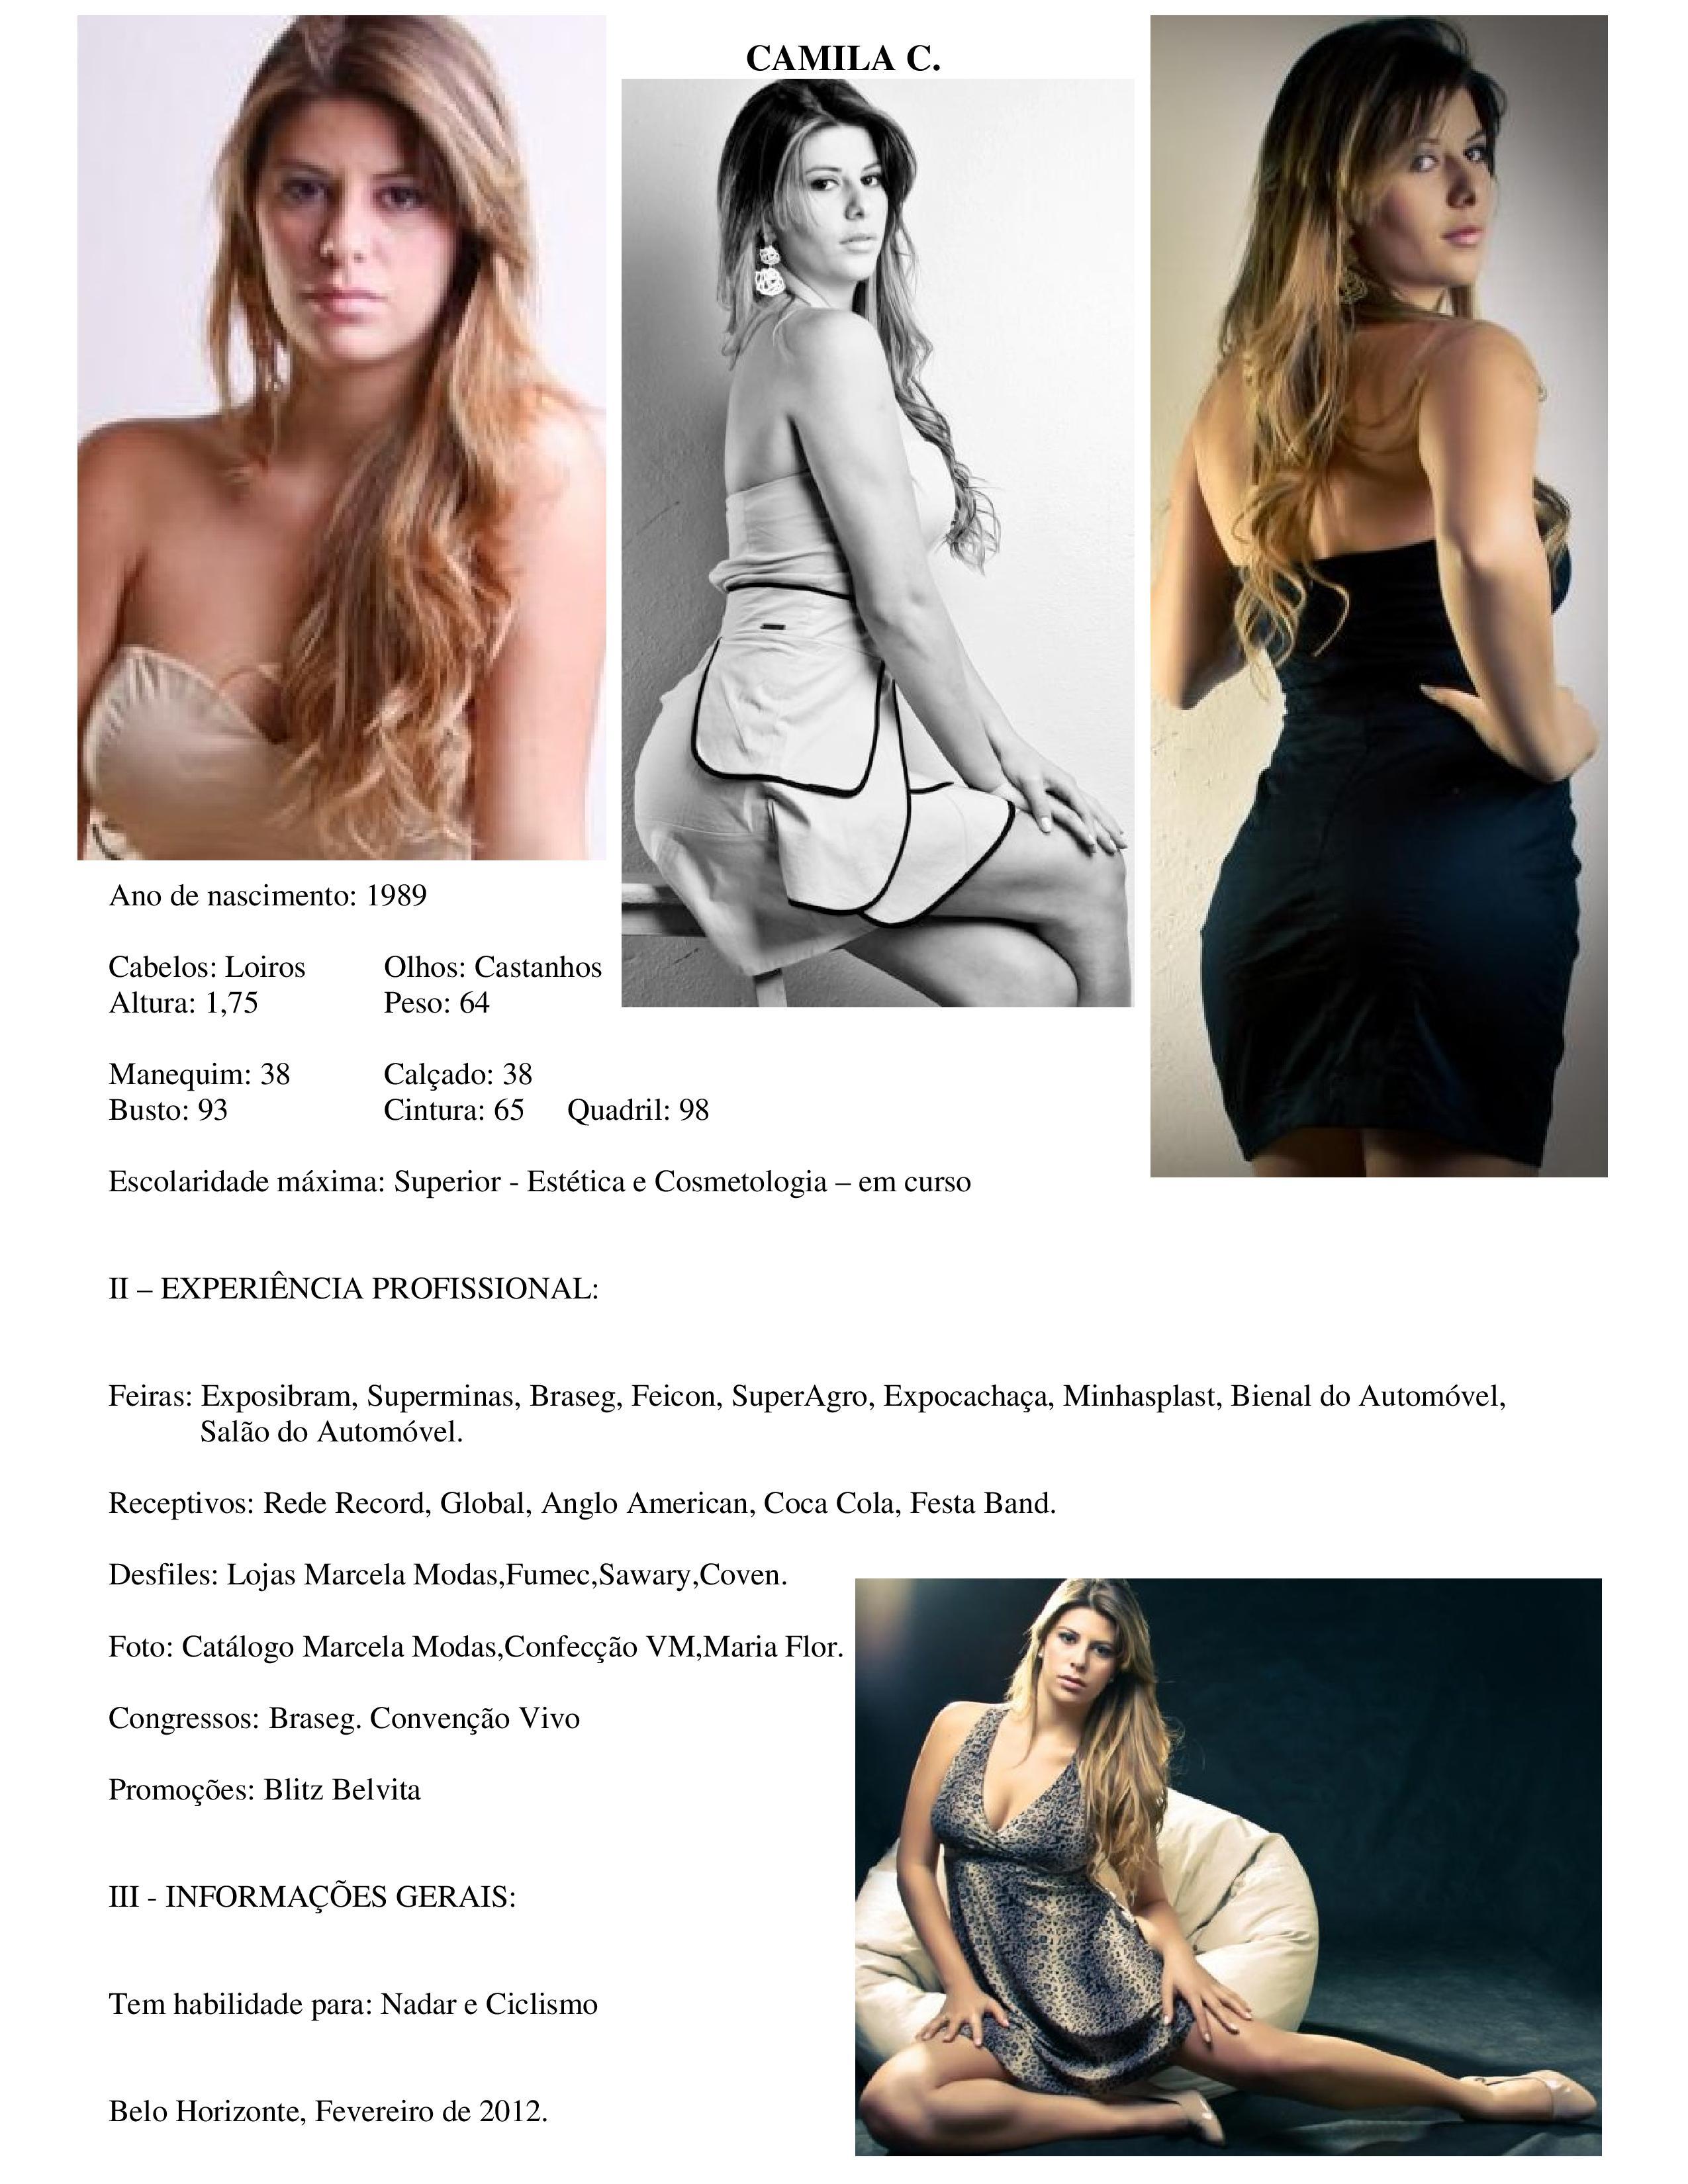 Camila Crespo-page-001